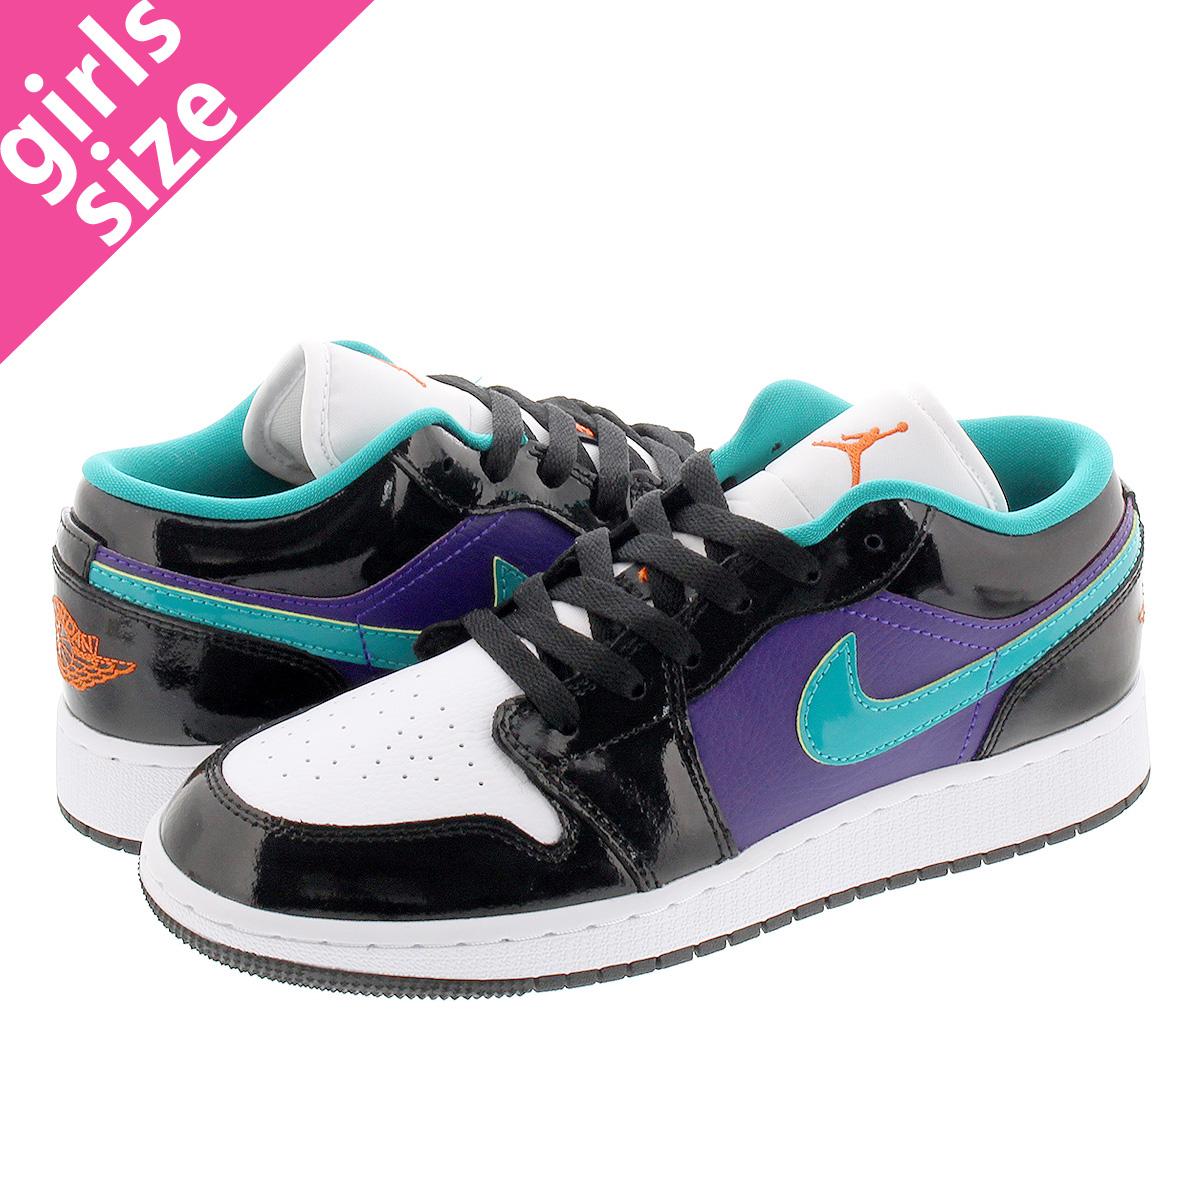 NIKE AIR JORDAN 1 LOW GS Nike Air Jordan 1 low GS BLACKWHITECOURT PURPLETURBO GREEN 553,560 035